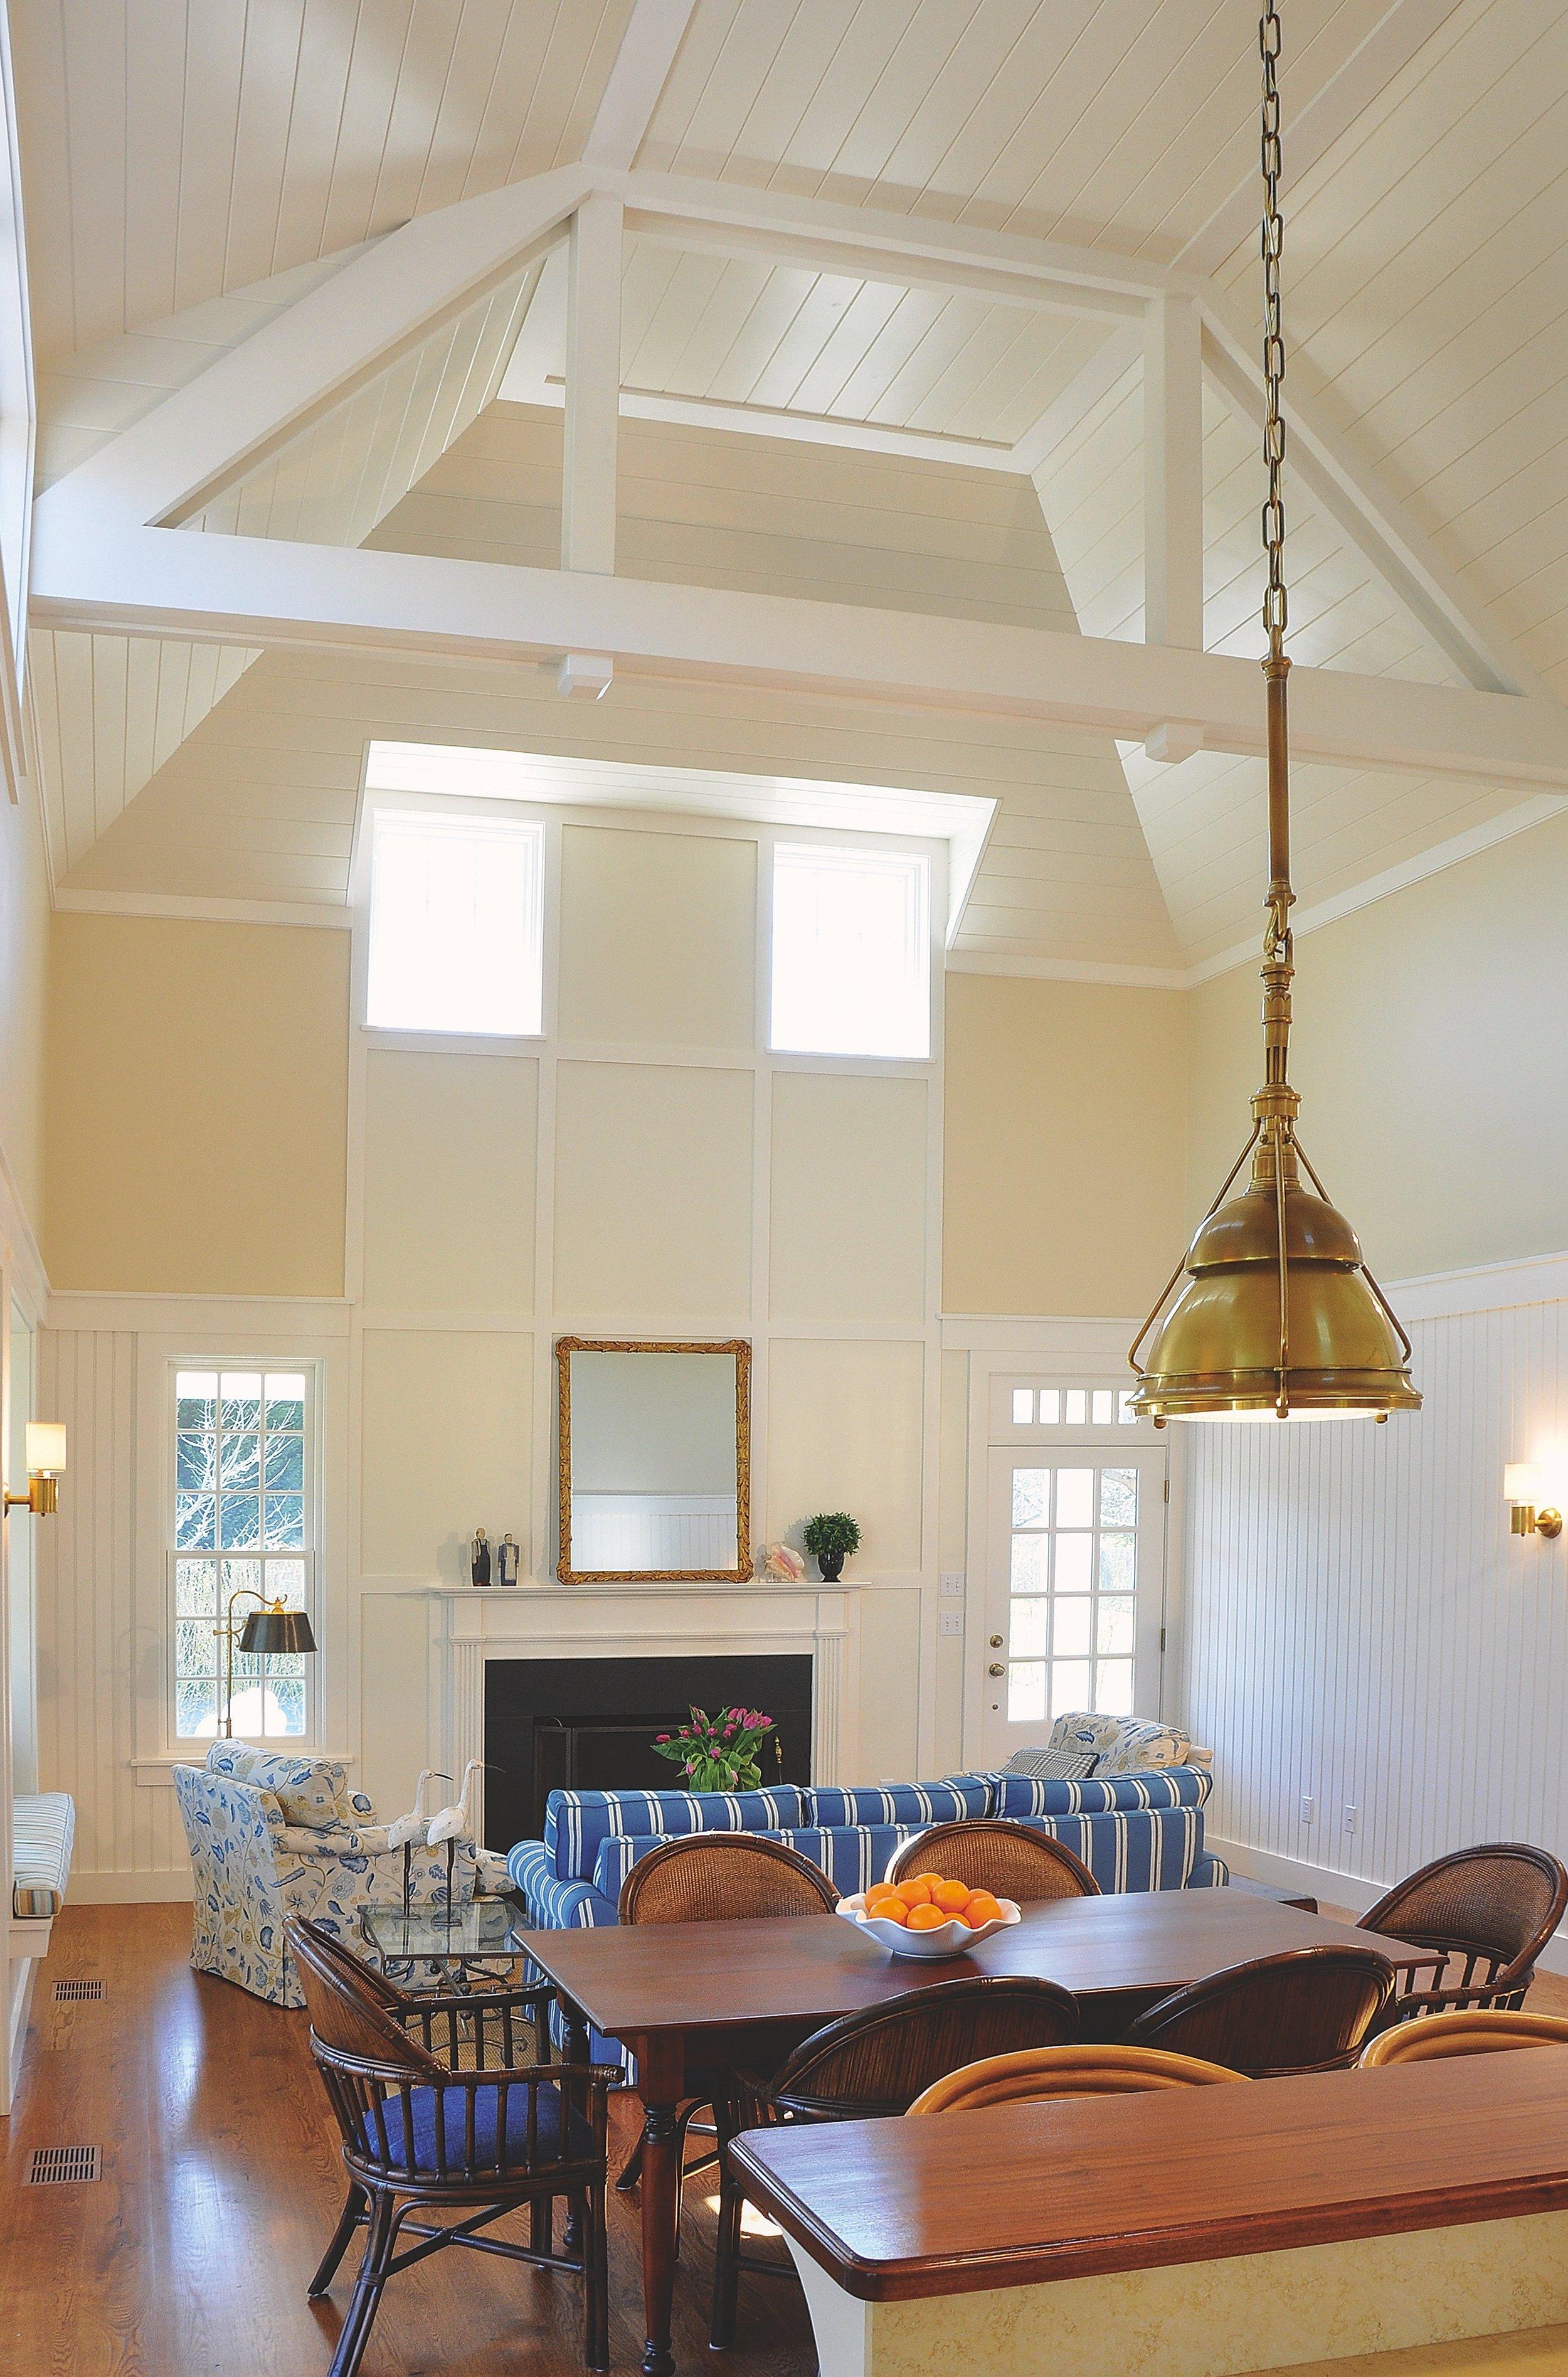 Modern_Farmhouse_Vaulted_Ceilings_Exposed_Beams_Brass_Chandelier_Pendant_Light_Lving_Room.jpg